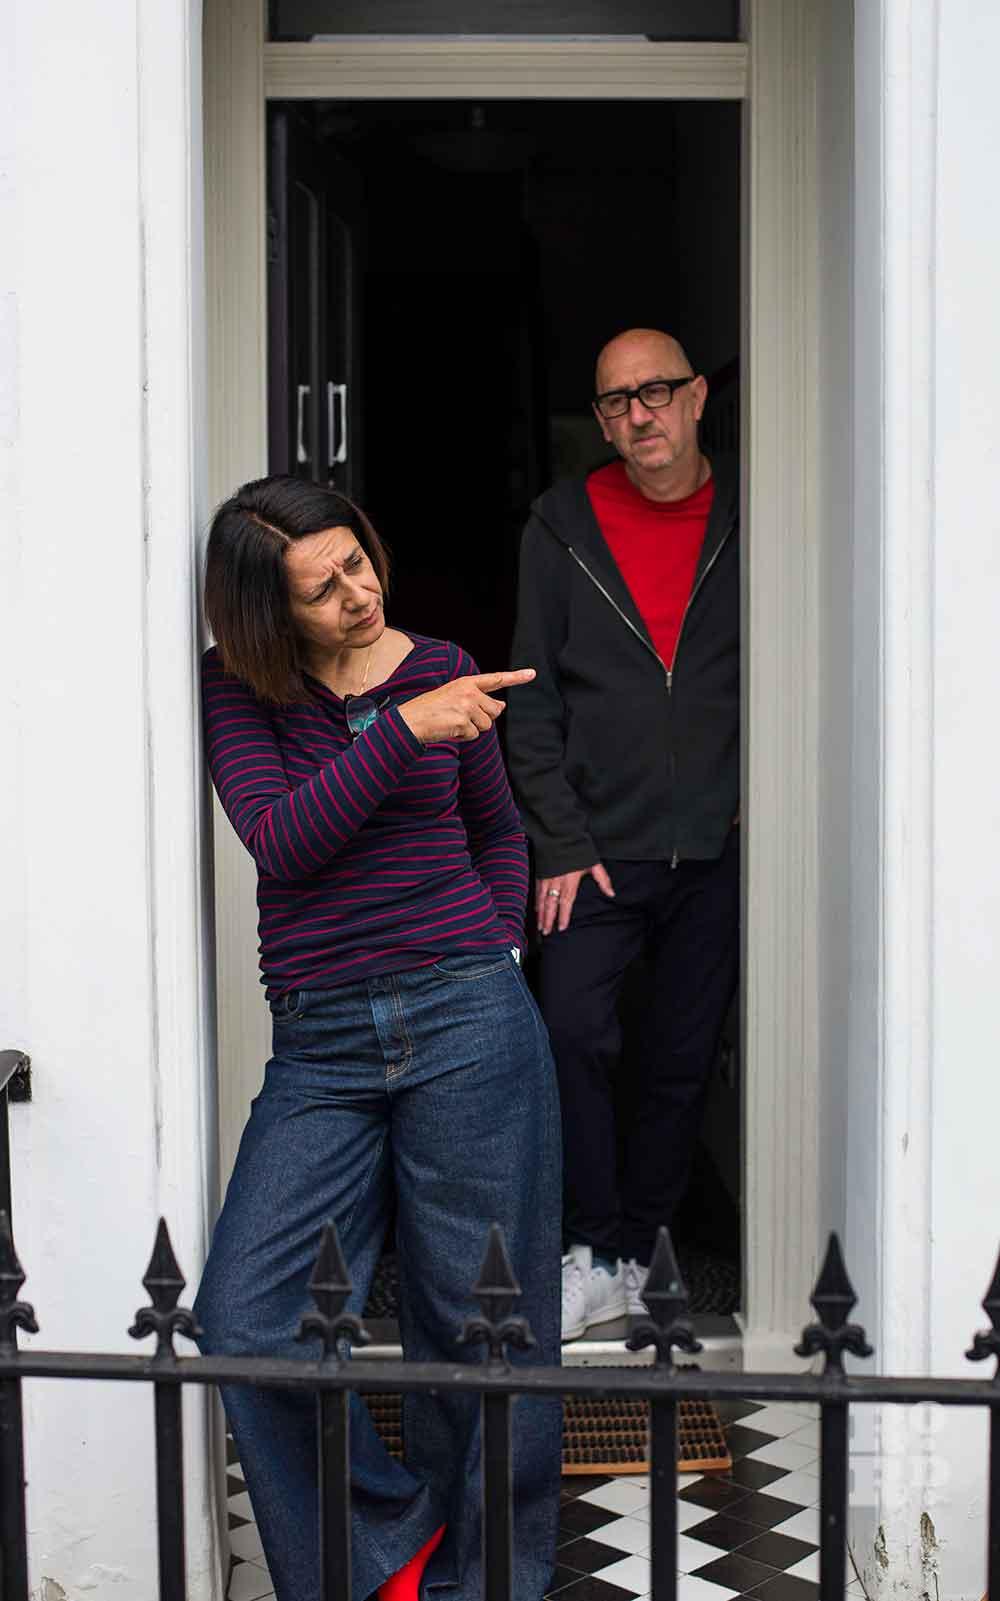 Husband and wife on their doorstep environmental portraits by Matt Payne